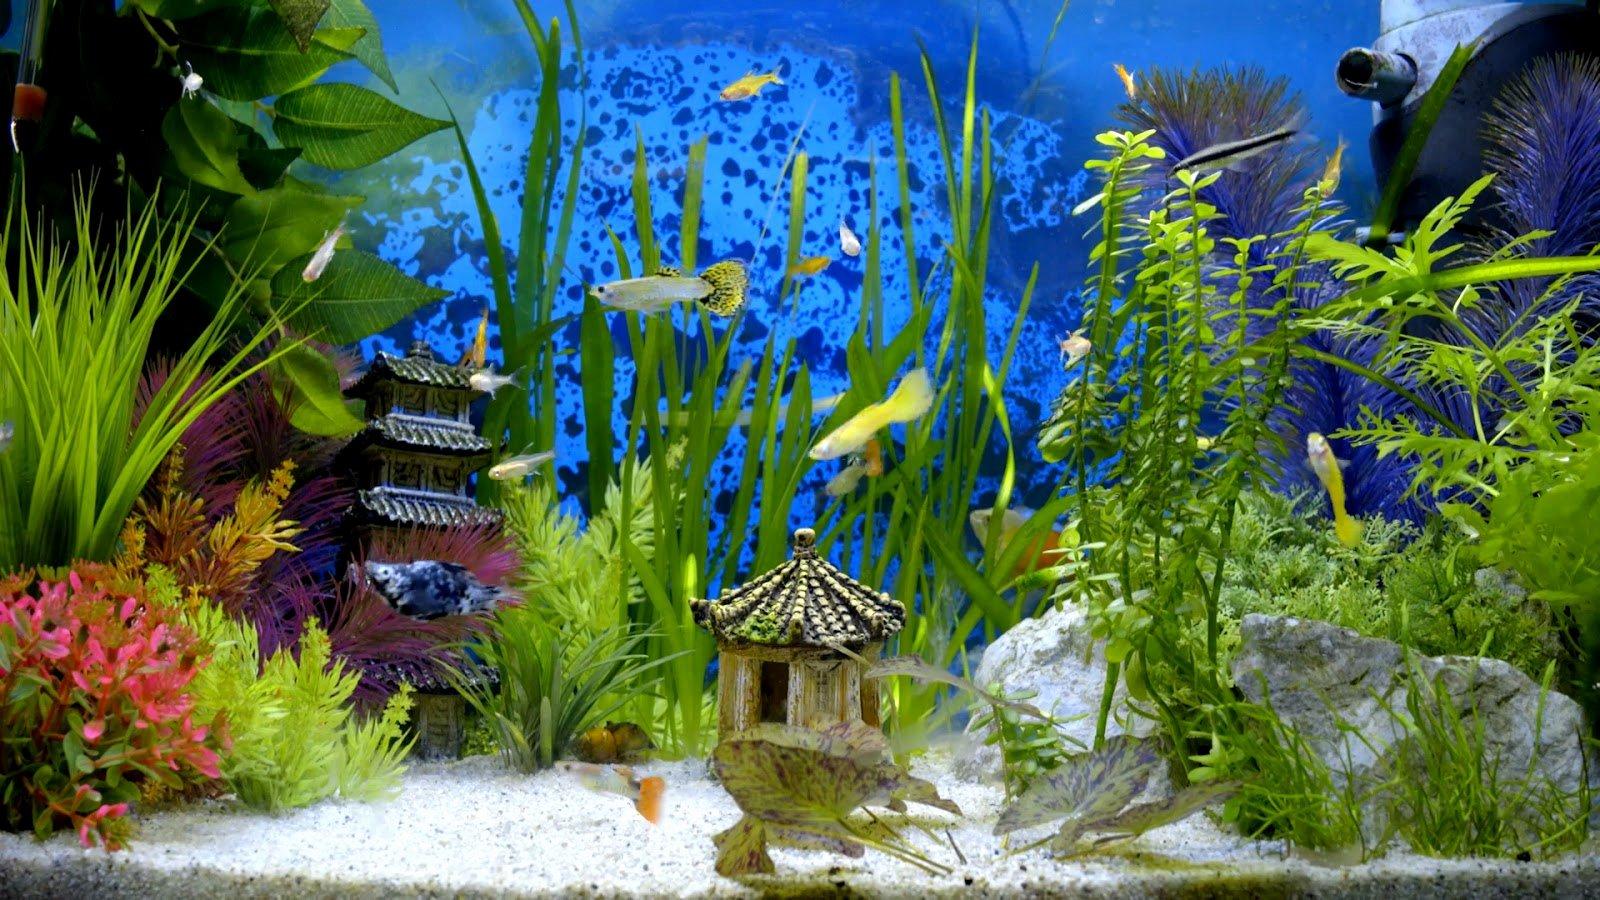 Cool Fish Tank Backgrounds Beautiful 4k Aquarium Video as Desktop Wallpaper